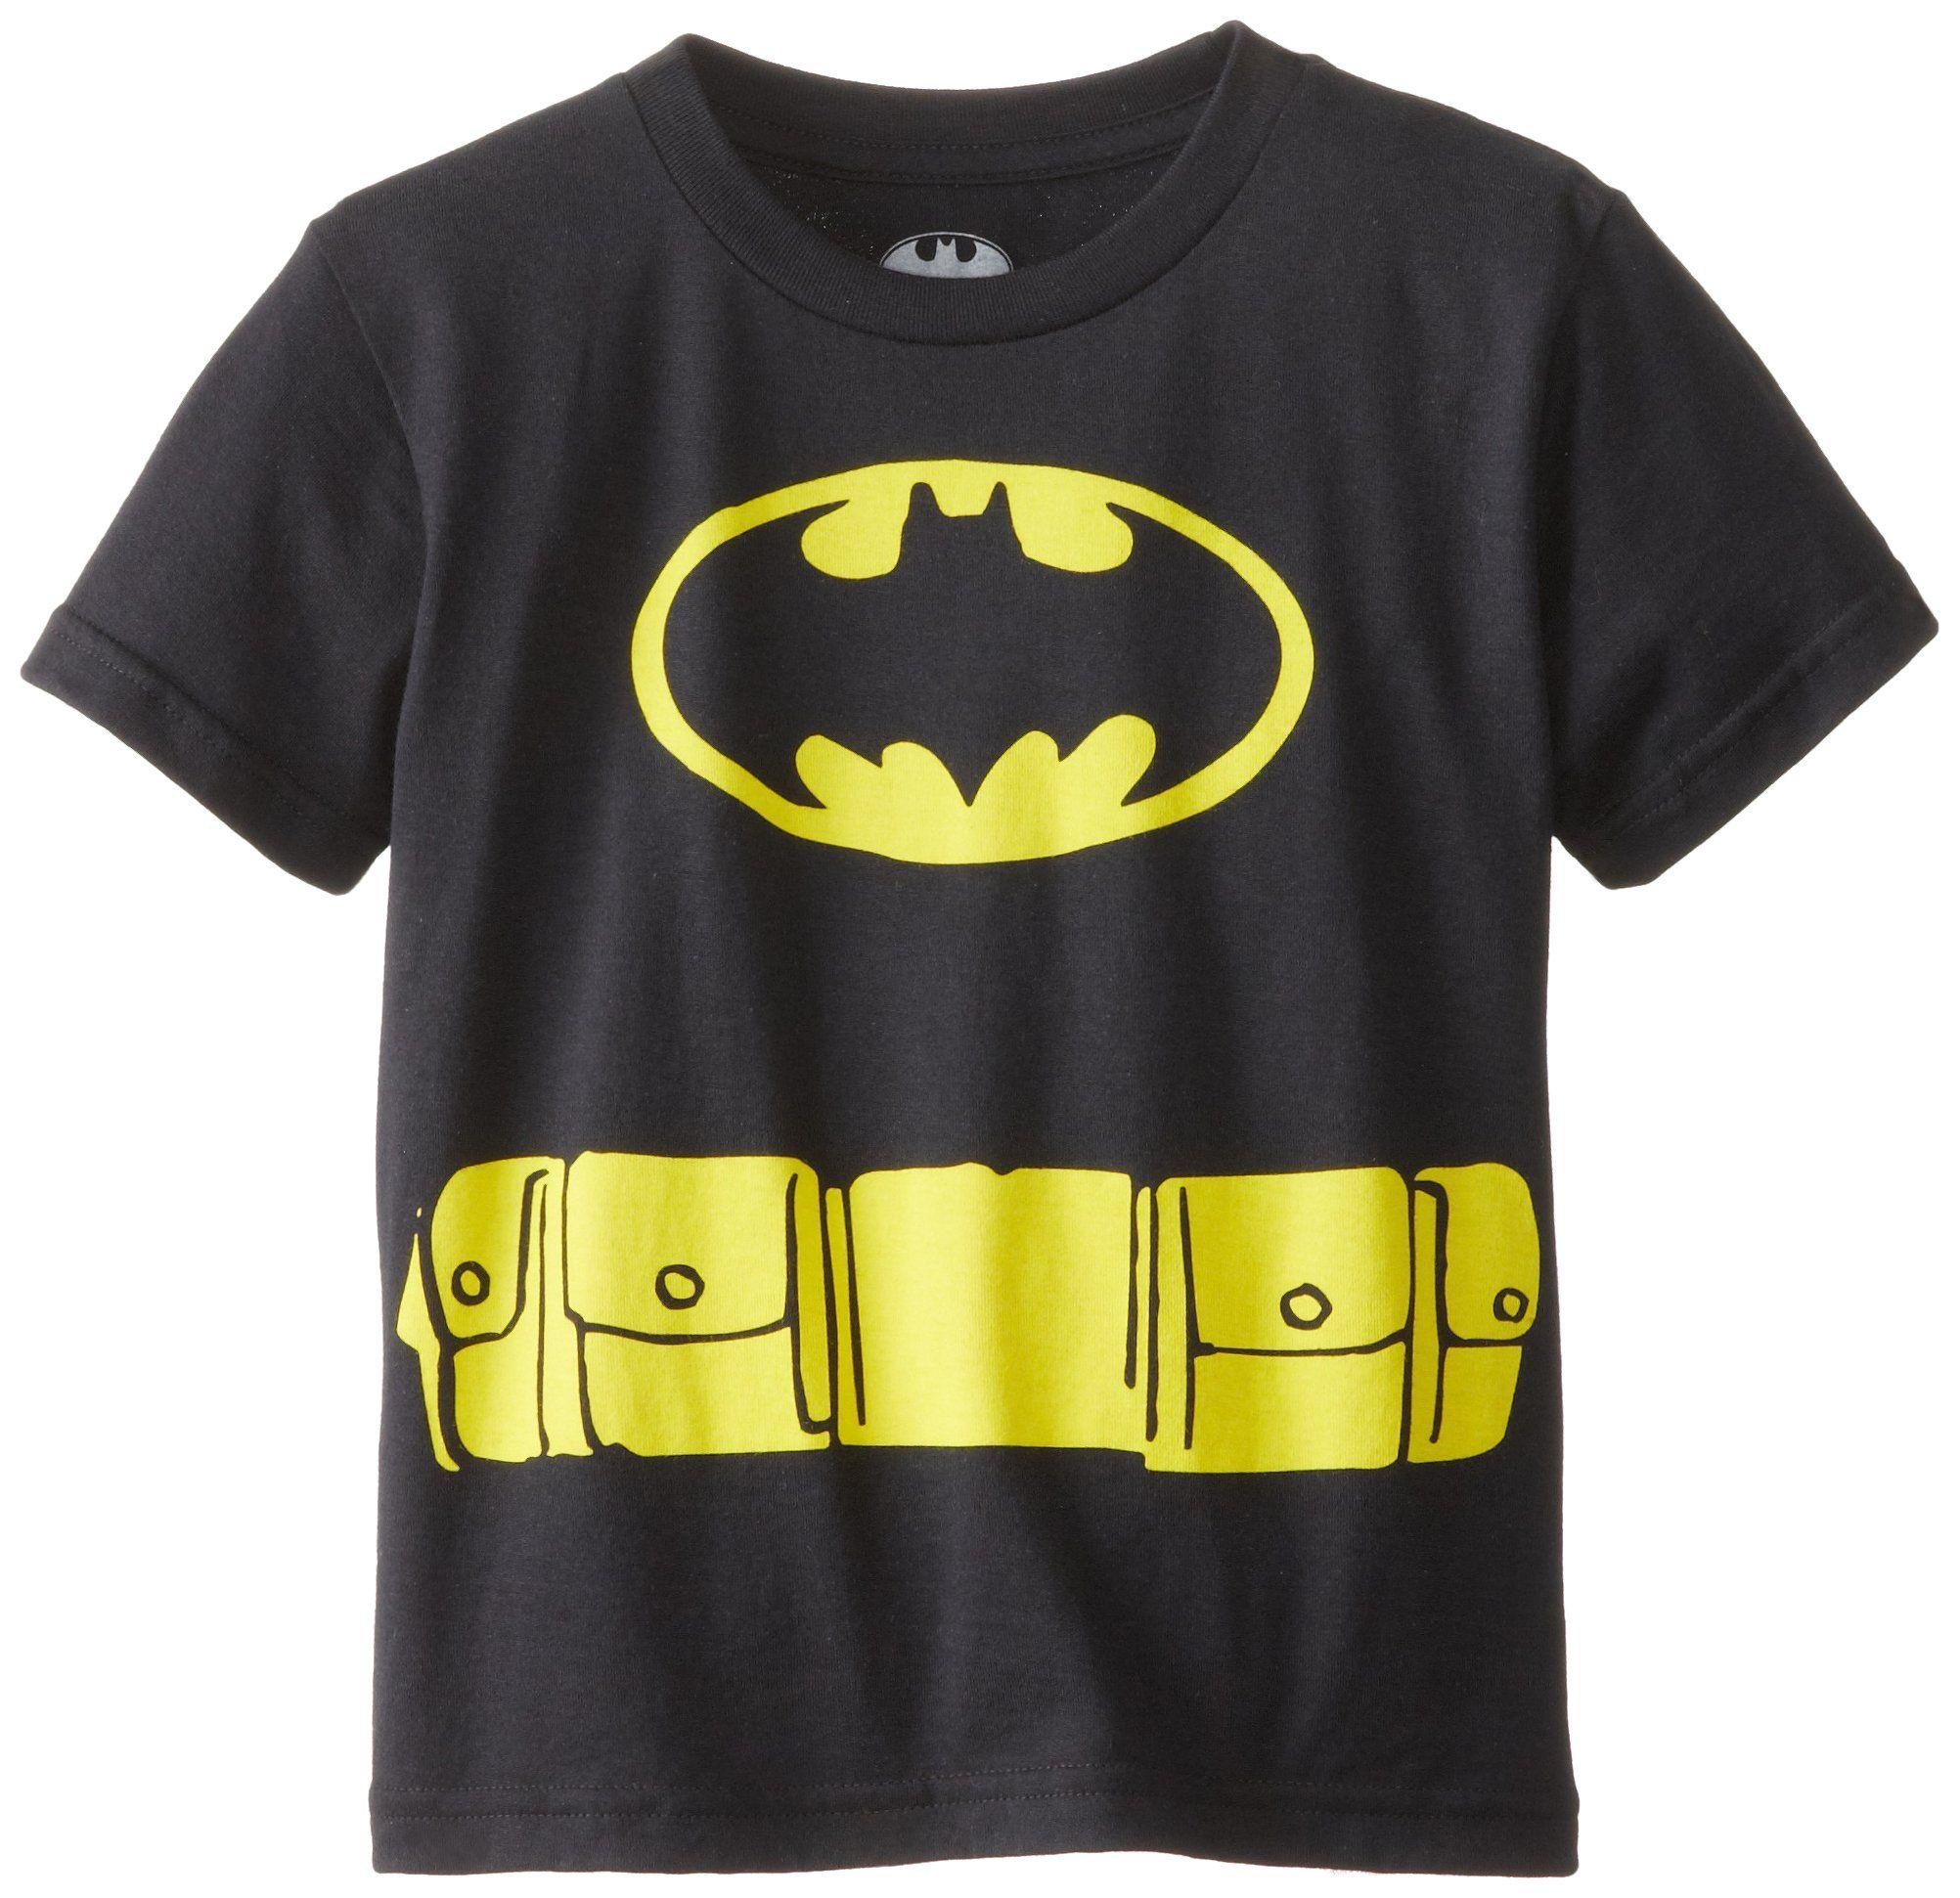 Youth Black DC Comics Super Hero Batman Logo T-Shirt Tee with Attachable Cape